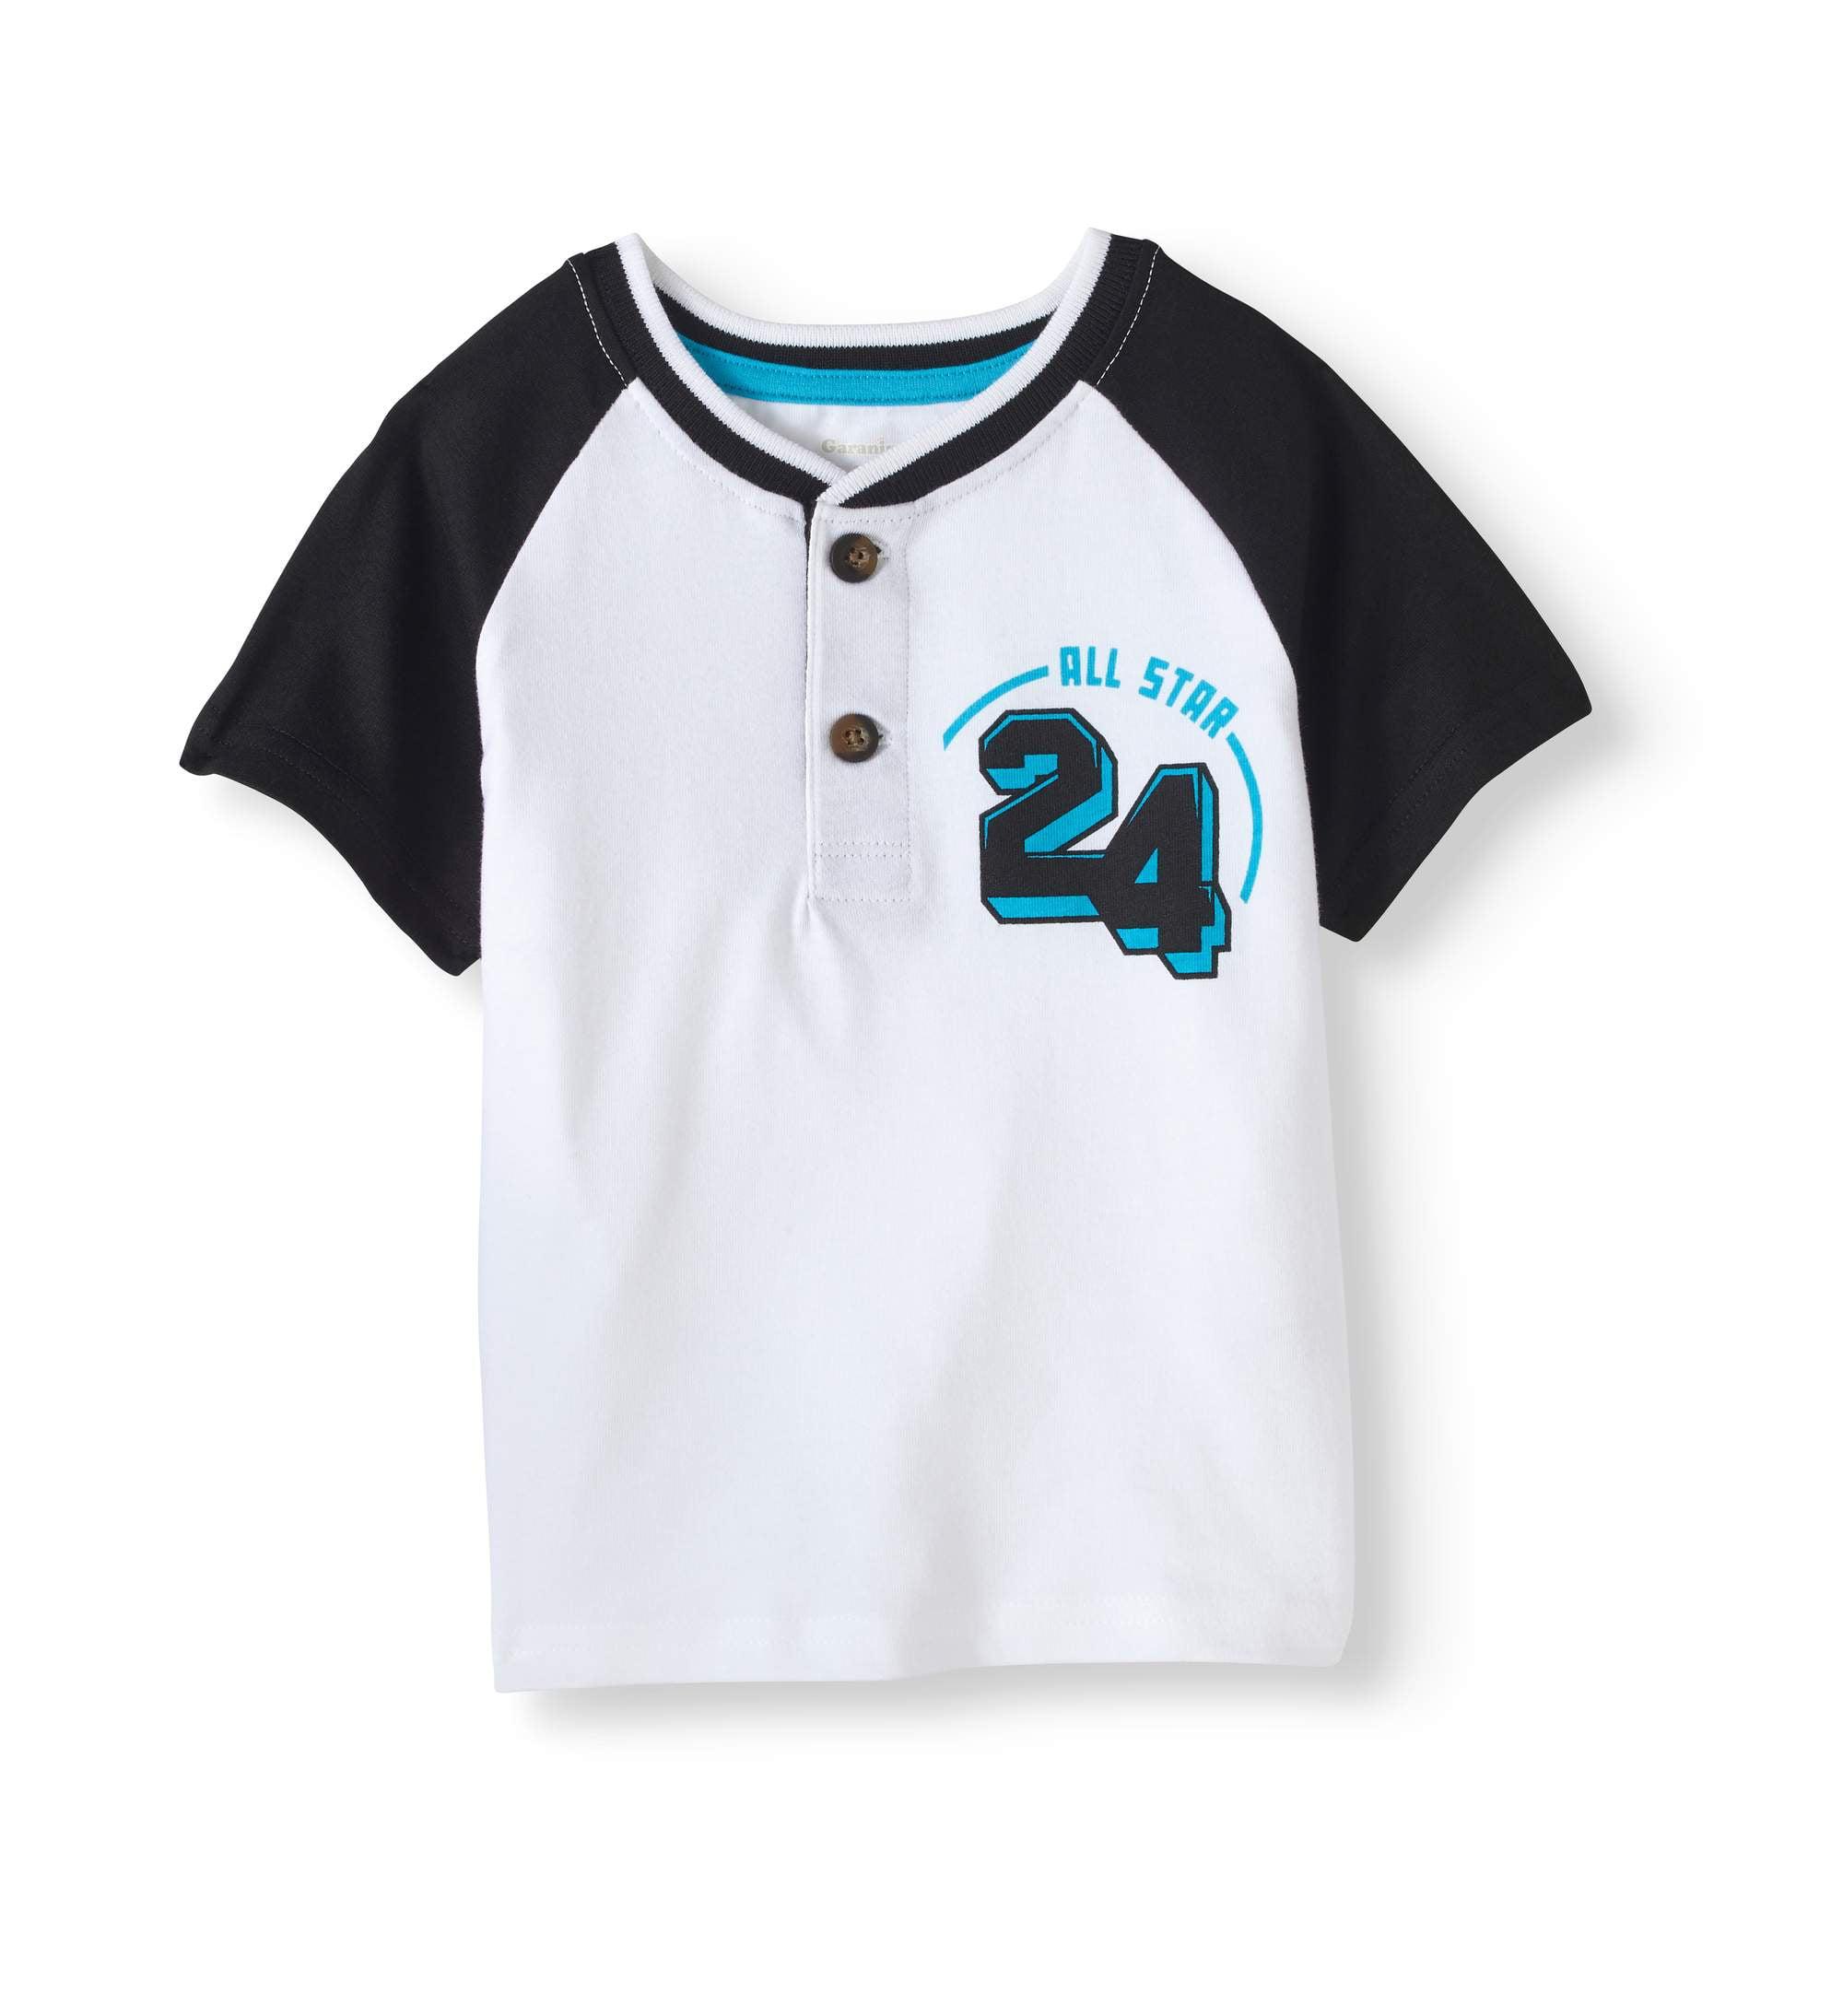 e2c9e7cdc Garanimals - Toddler Boy Short Sleeve Graphic Henley Top - Walmart.com